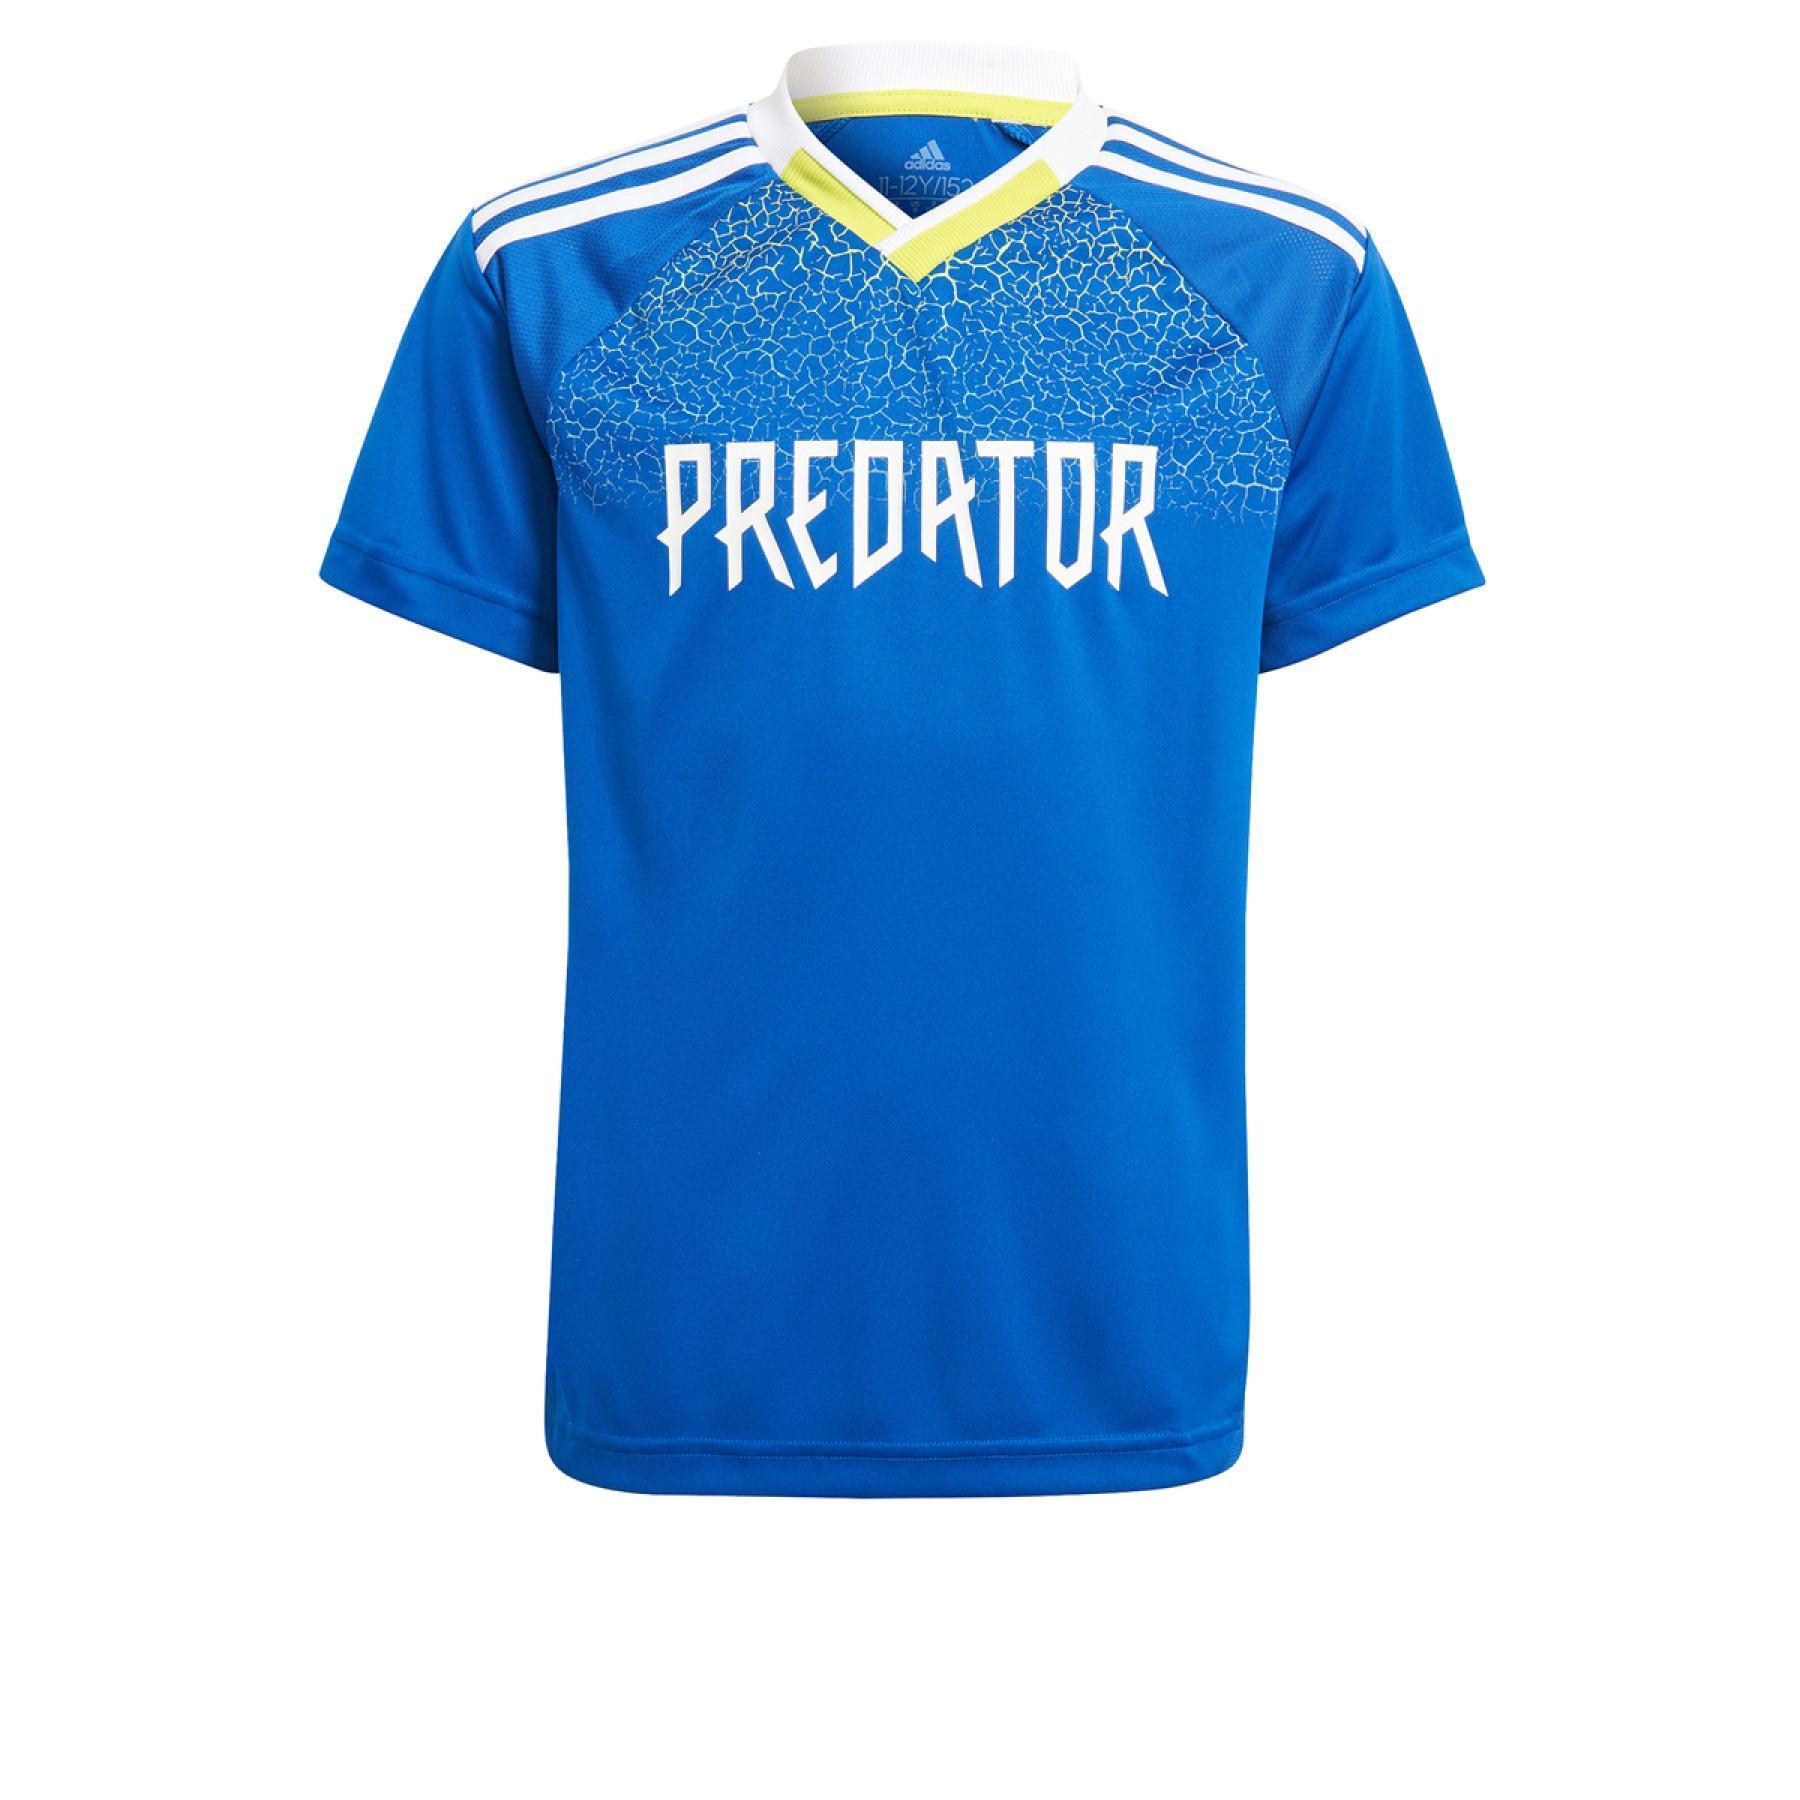 Children's jersey adidas Predator Football-Inspired